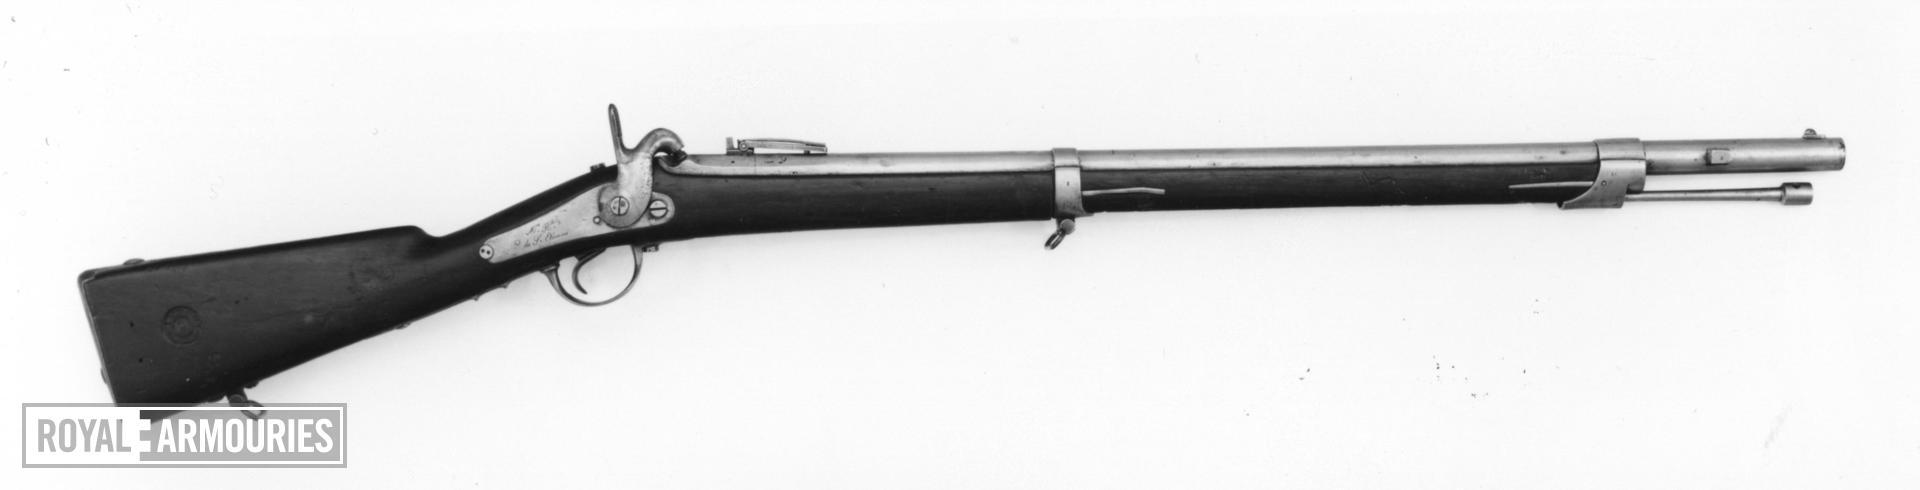 Percussion muzzle-loading military rifle - Model 1840